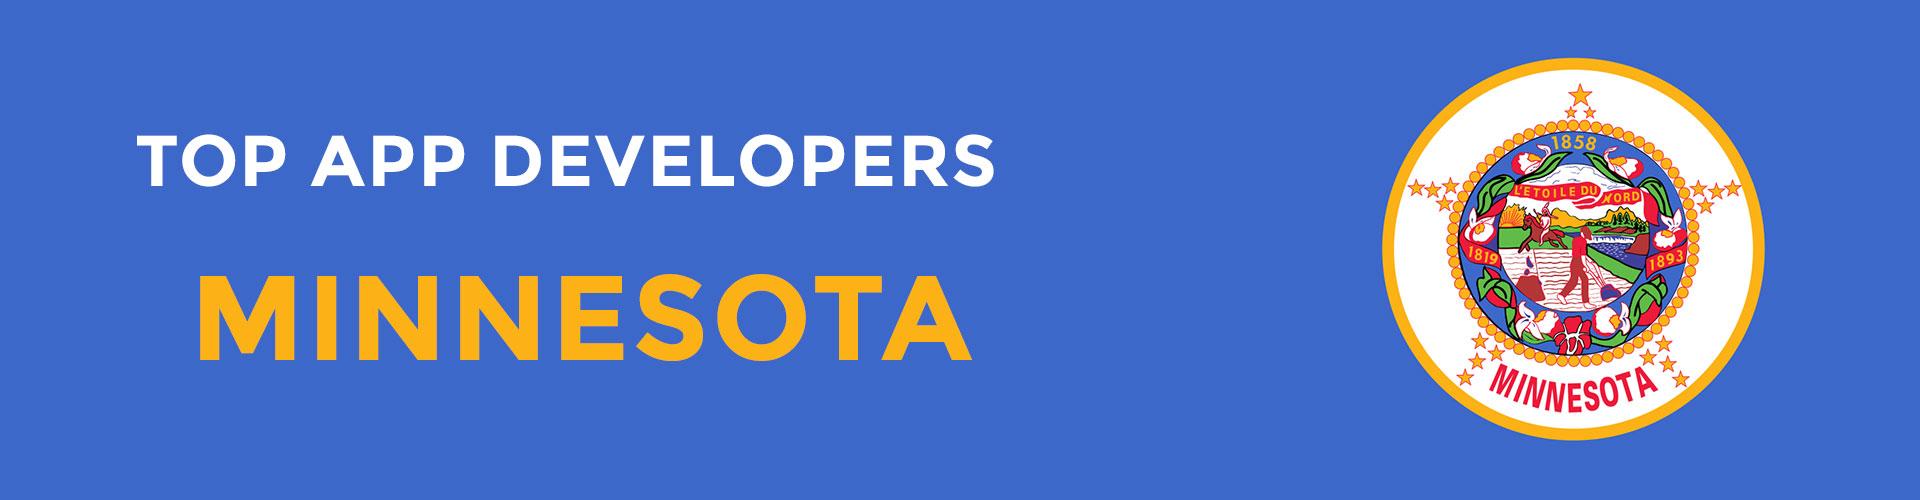 mobile app development company minnesota